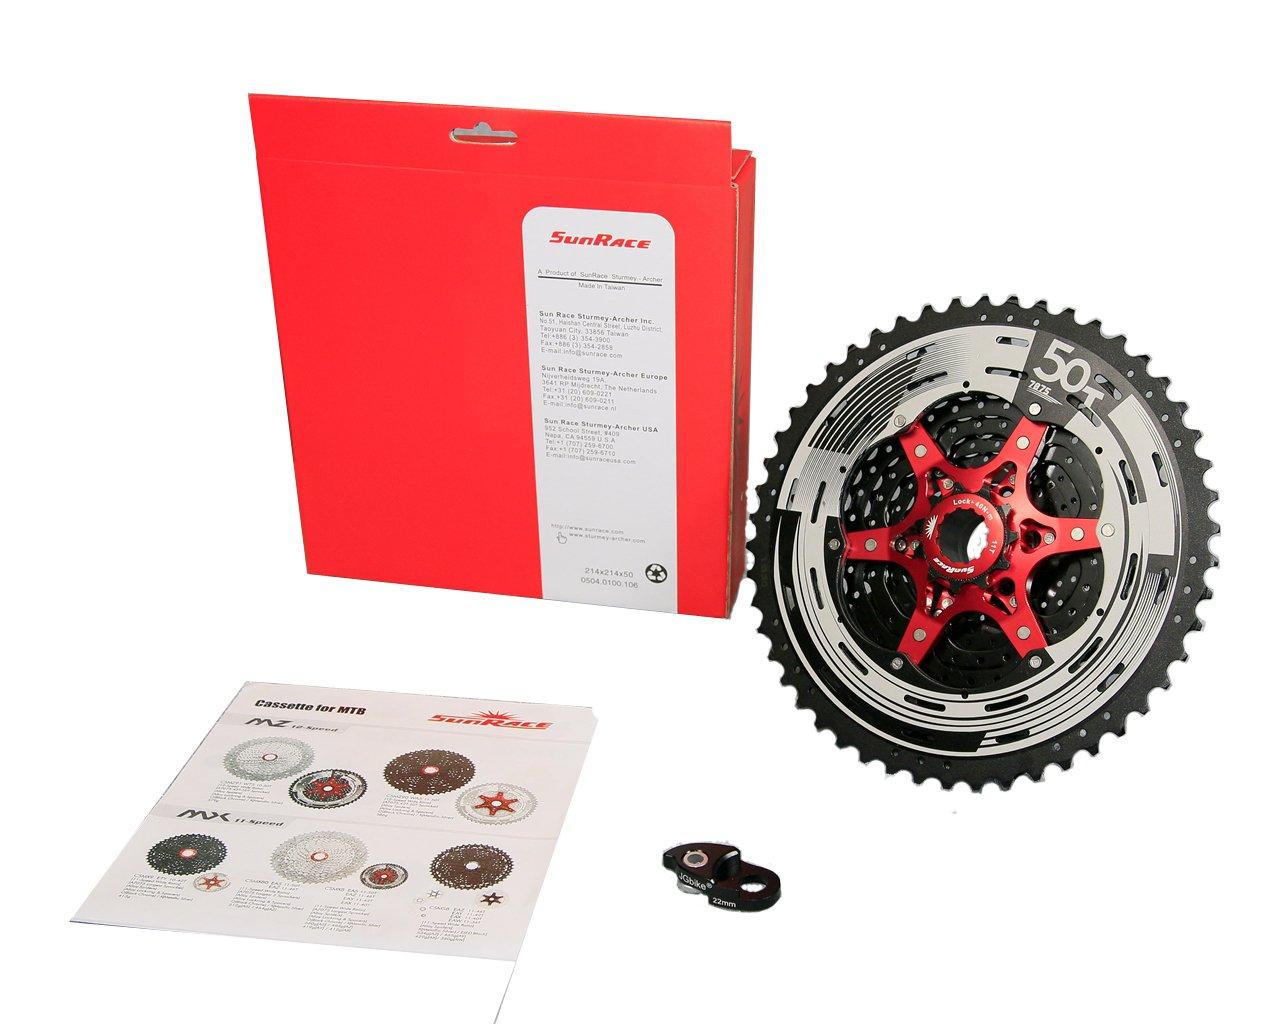 Sunrace 11-speed 11-50T CSMX80 wide ratio MTB Cassette freewheel with rear derailleur extender by JGbike (Black Chrome) by JGbike (Image #2)